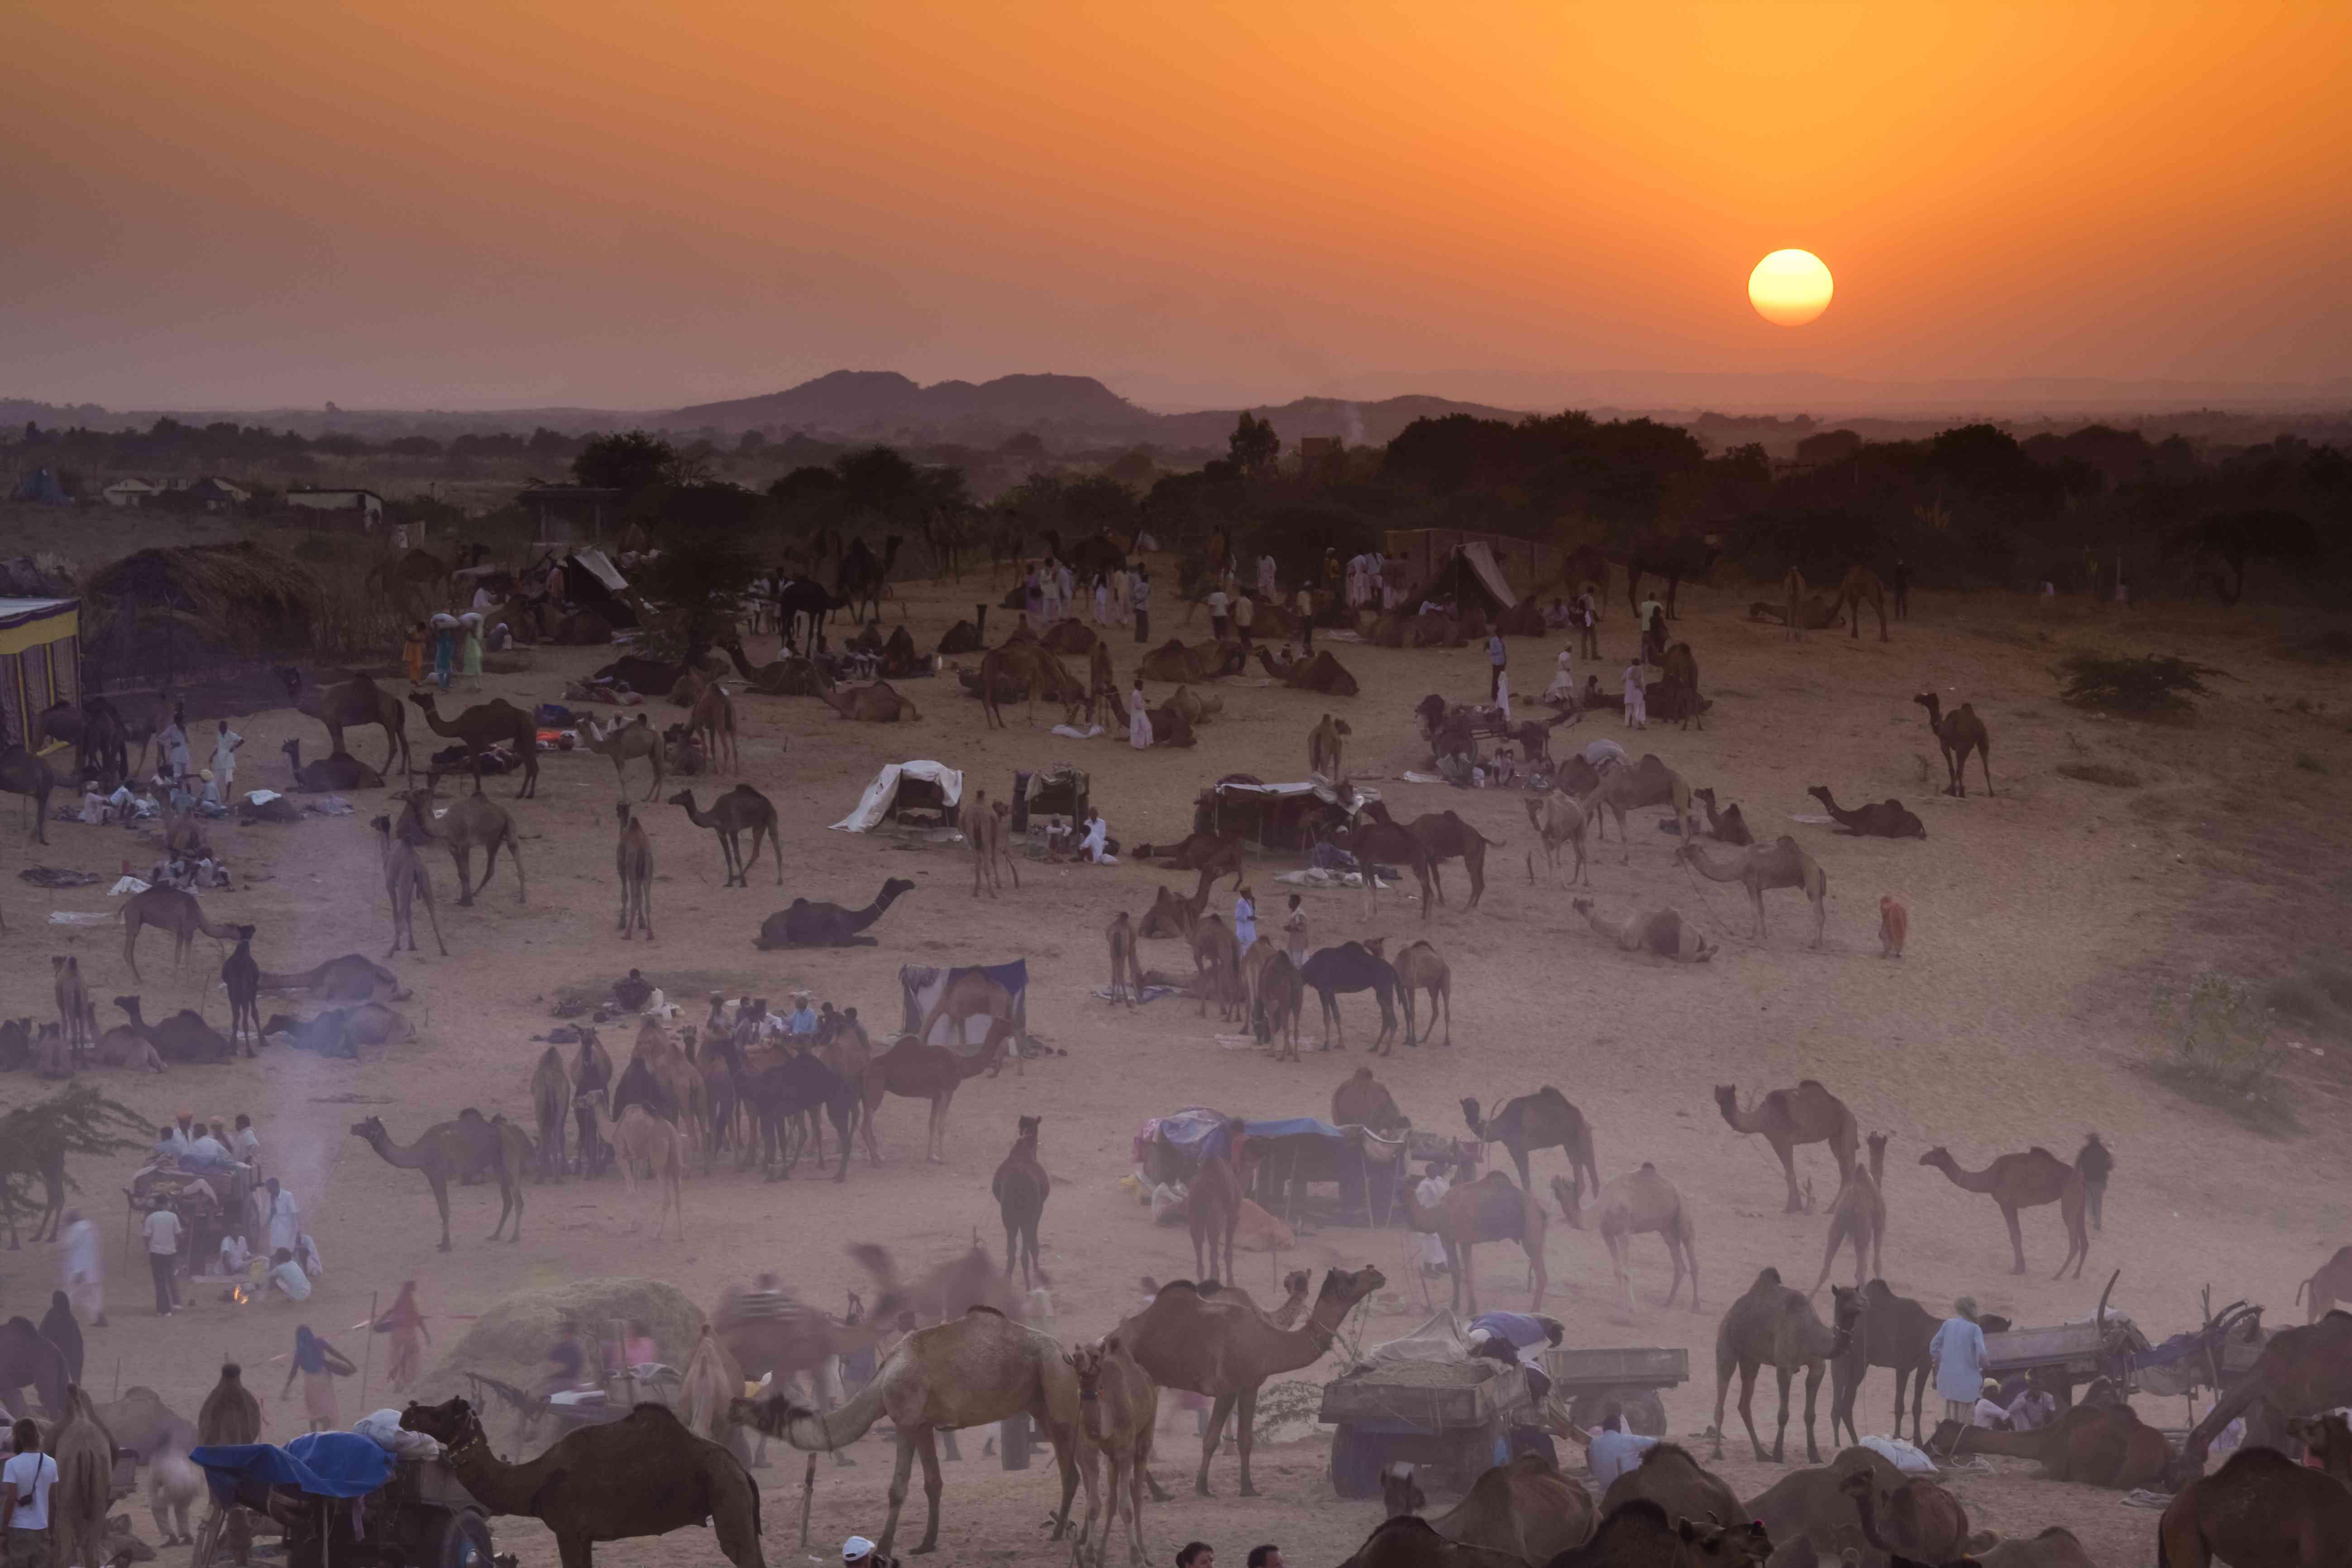 Camels in the desert at sunset for the Pushkar Camel Fair